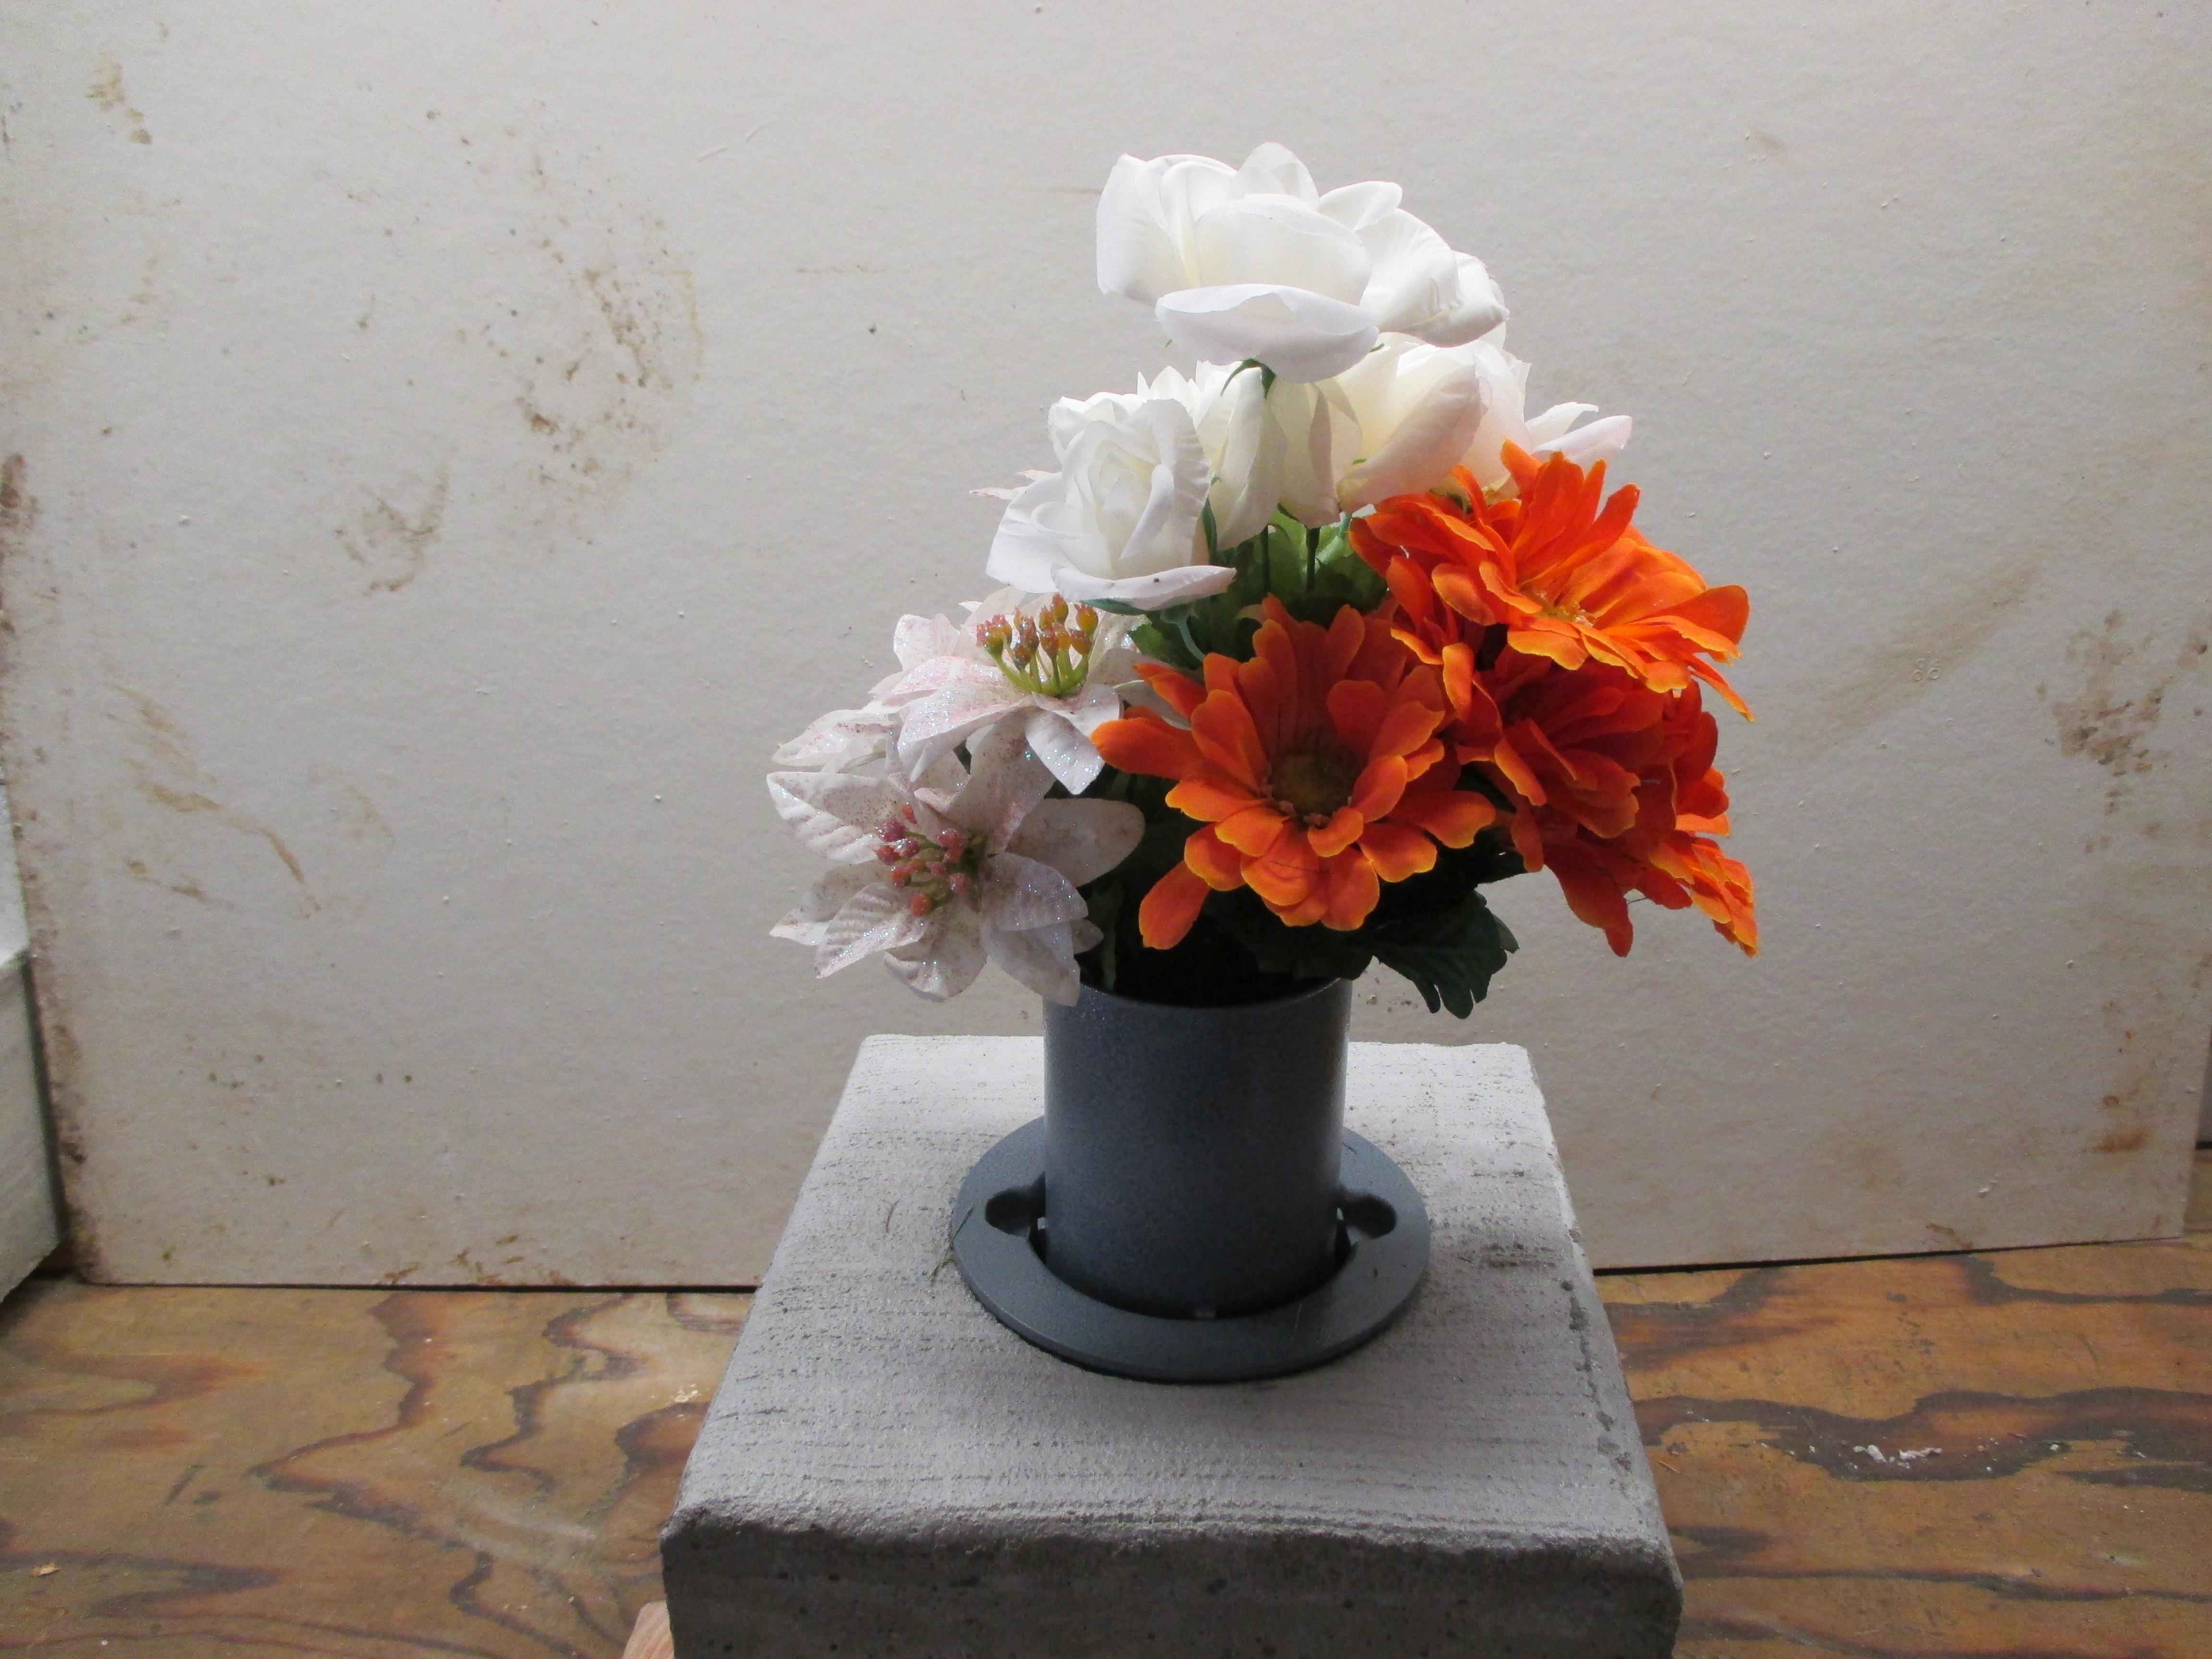 vases in ground cemetery flower luxury vase